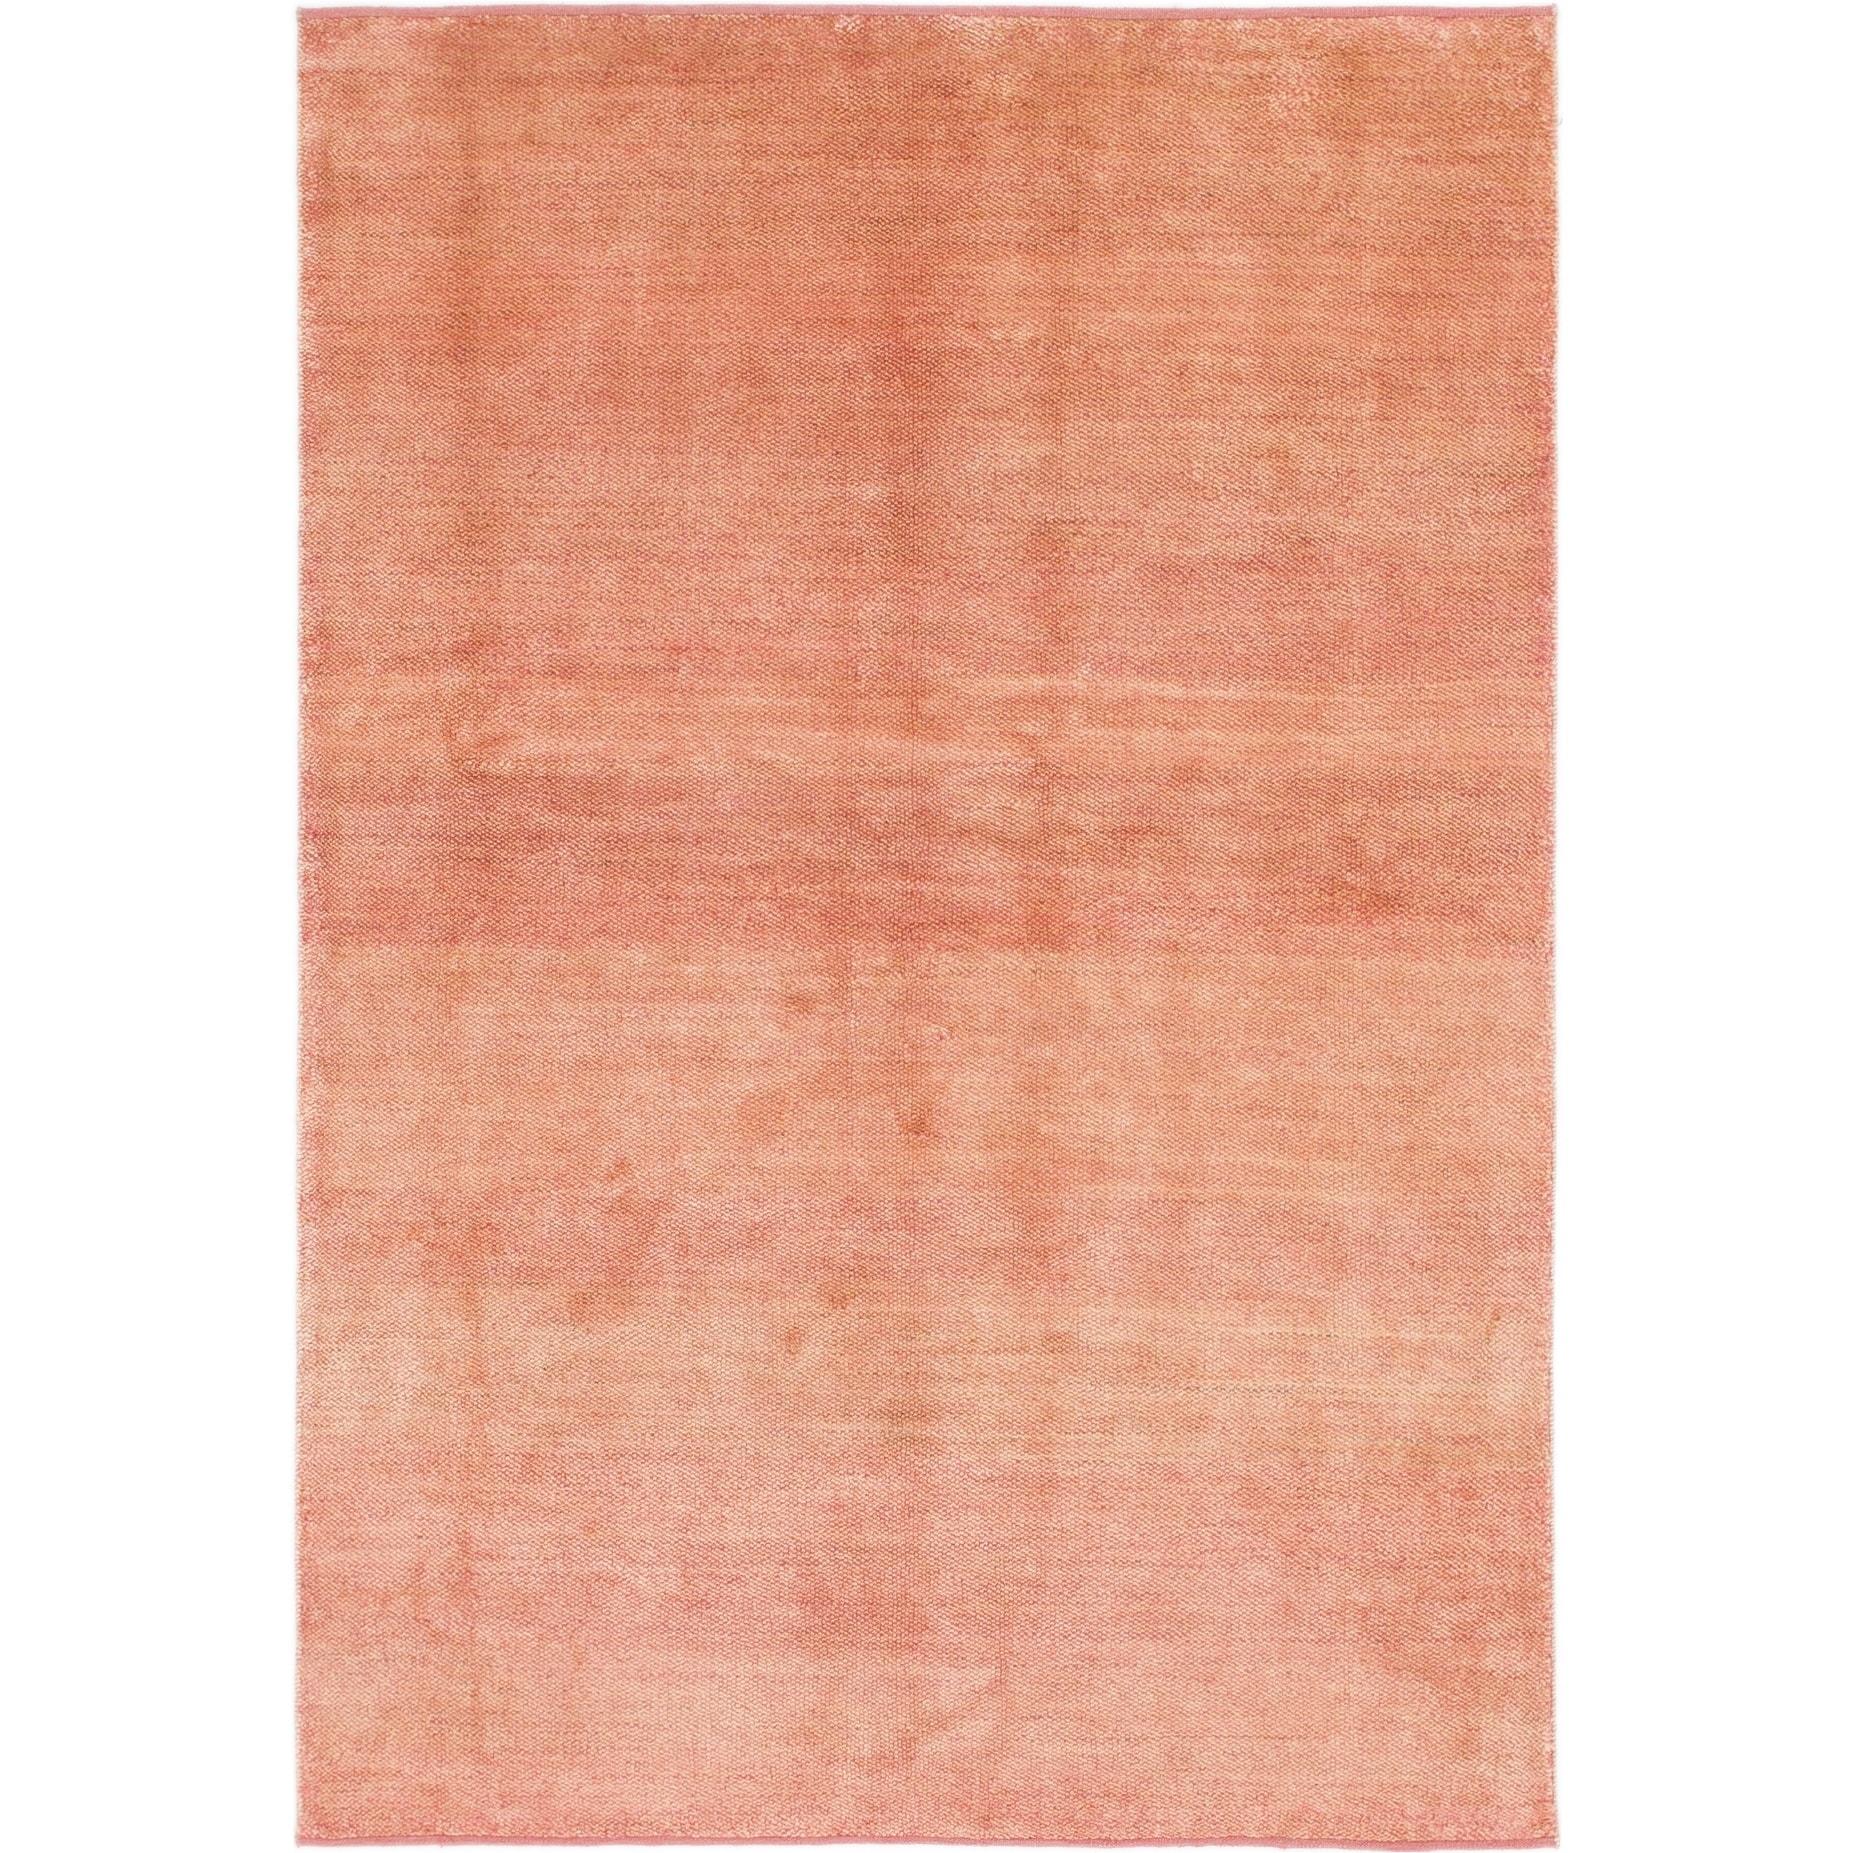 Hand Knotted Kashkuli Gabbeh Wool Area Rug - 5 6 x 8 (puce - 5 6 x 8)